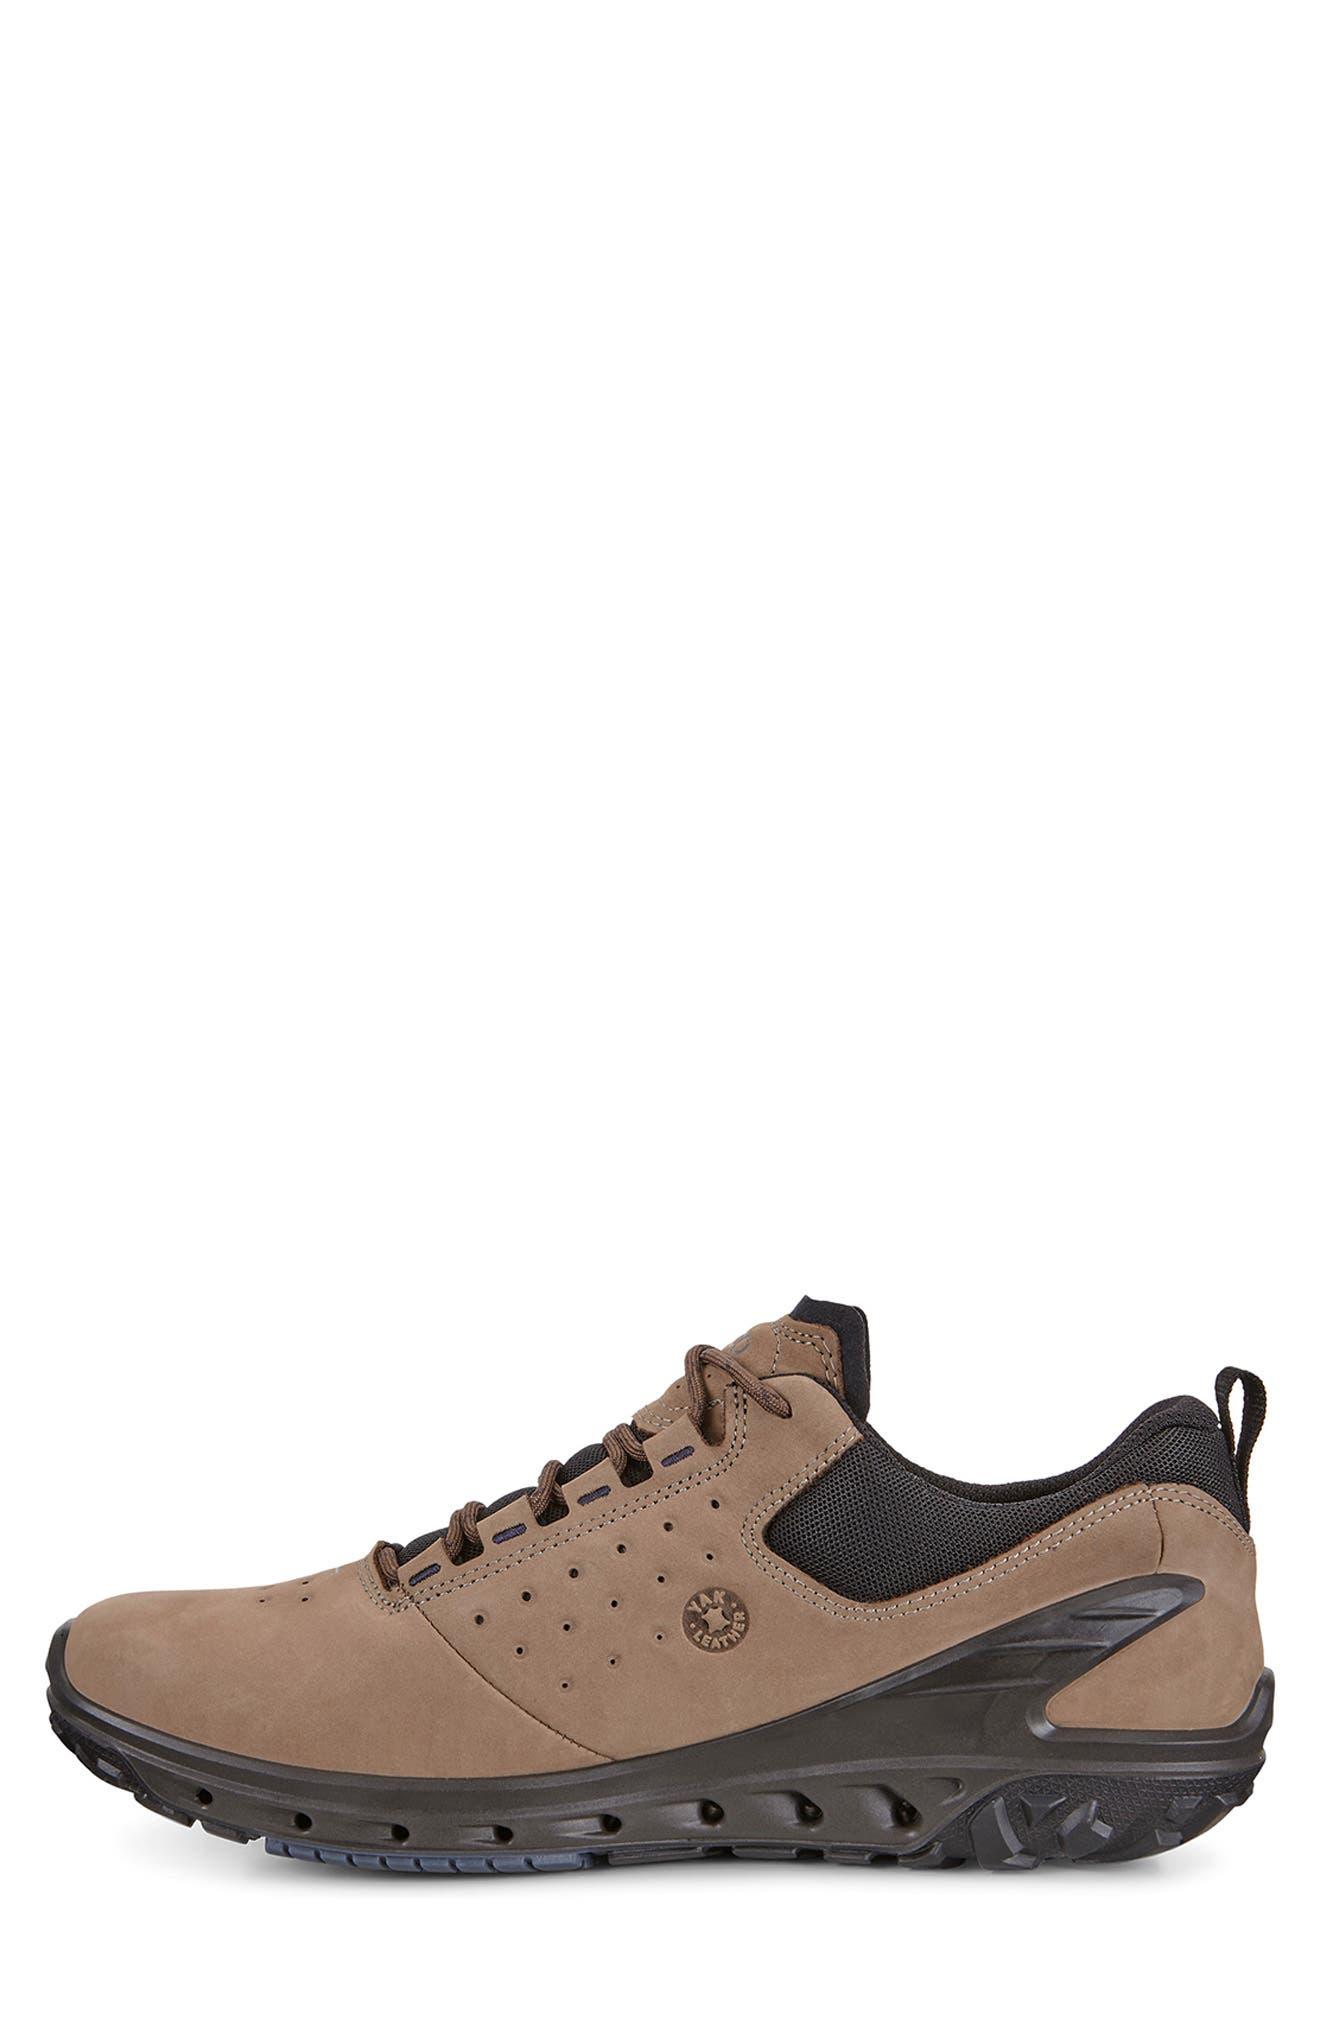 Biom Venture GTX Sneaker,                             Alternate thumbnail 5, color,                             BIRCH BROWN LEATHER